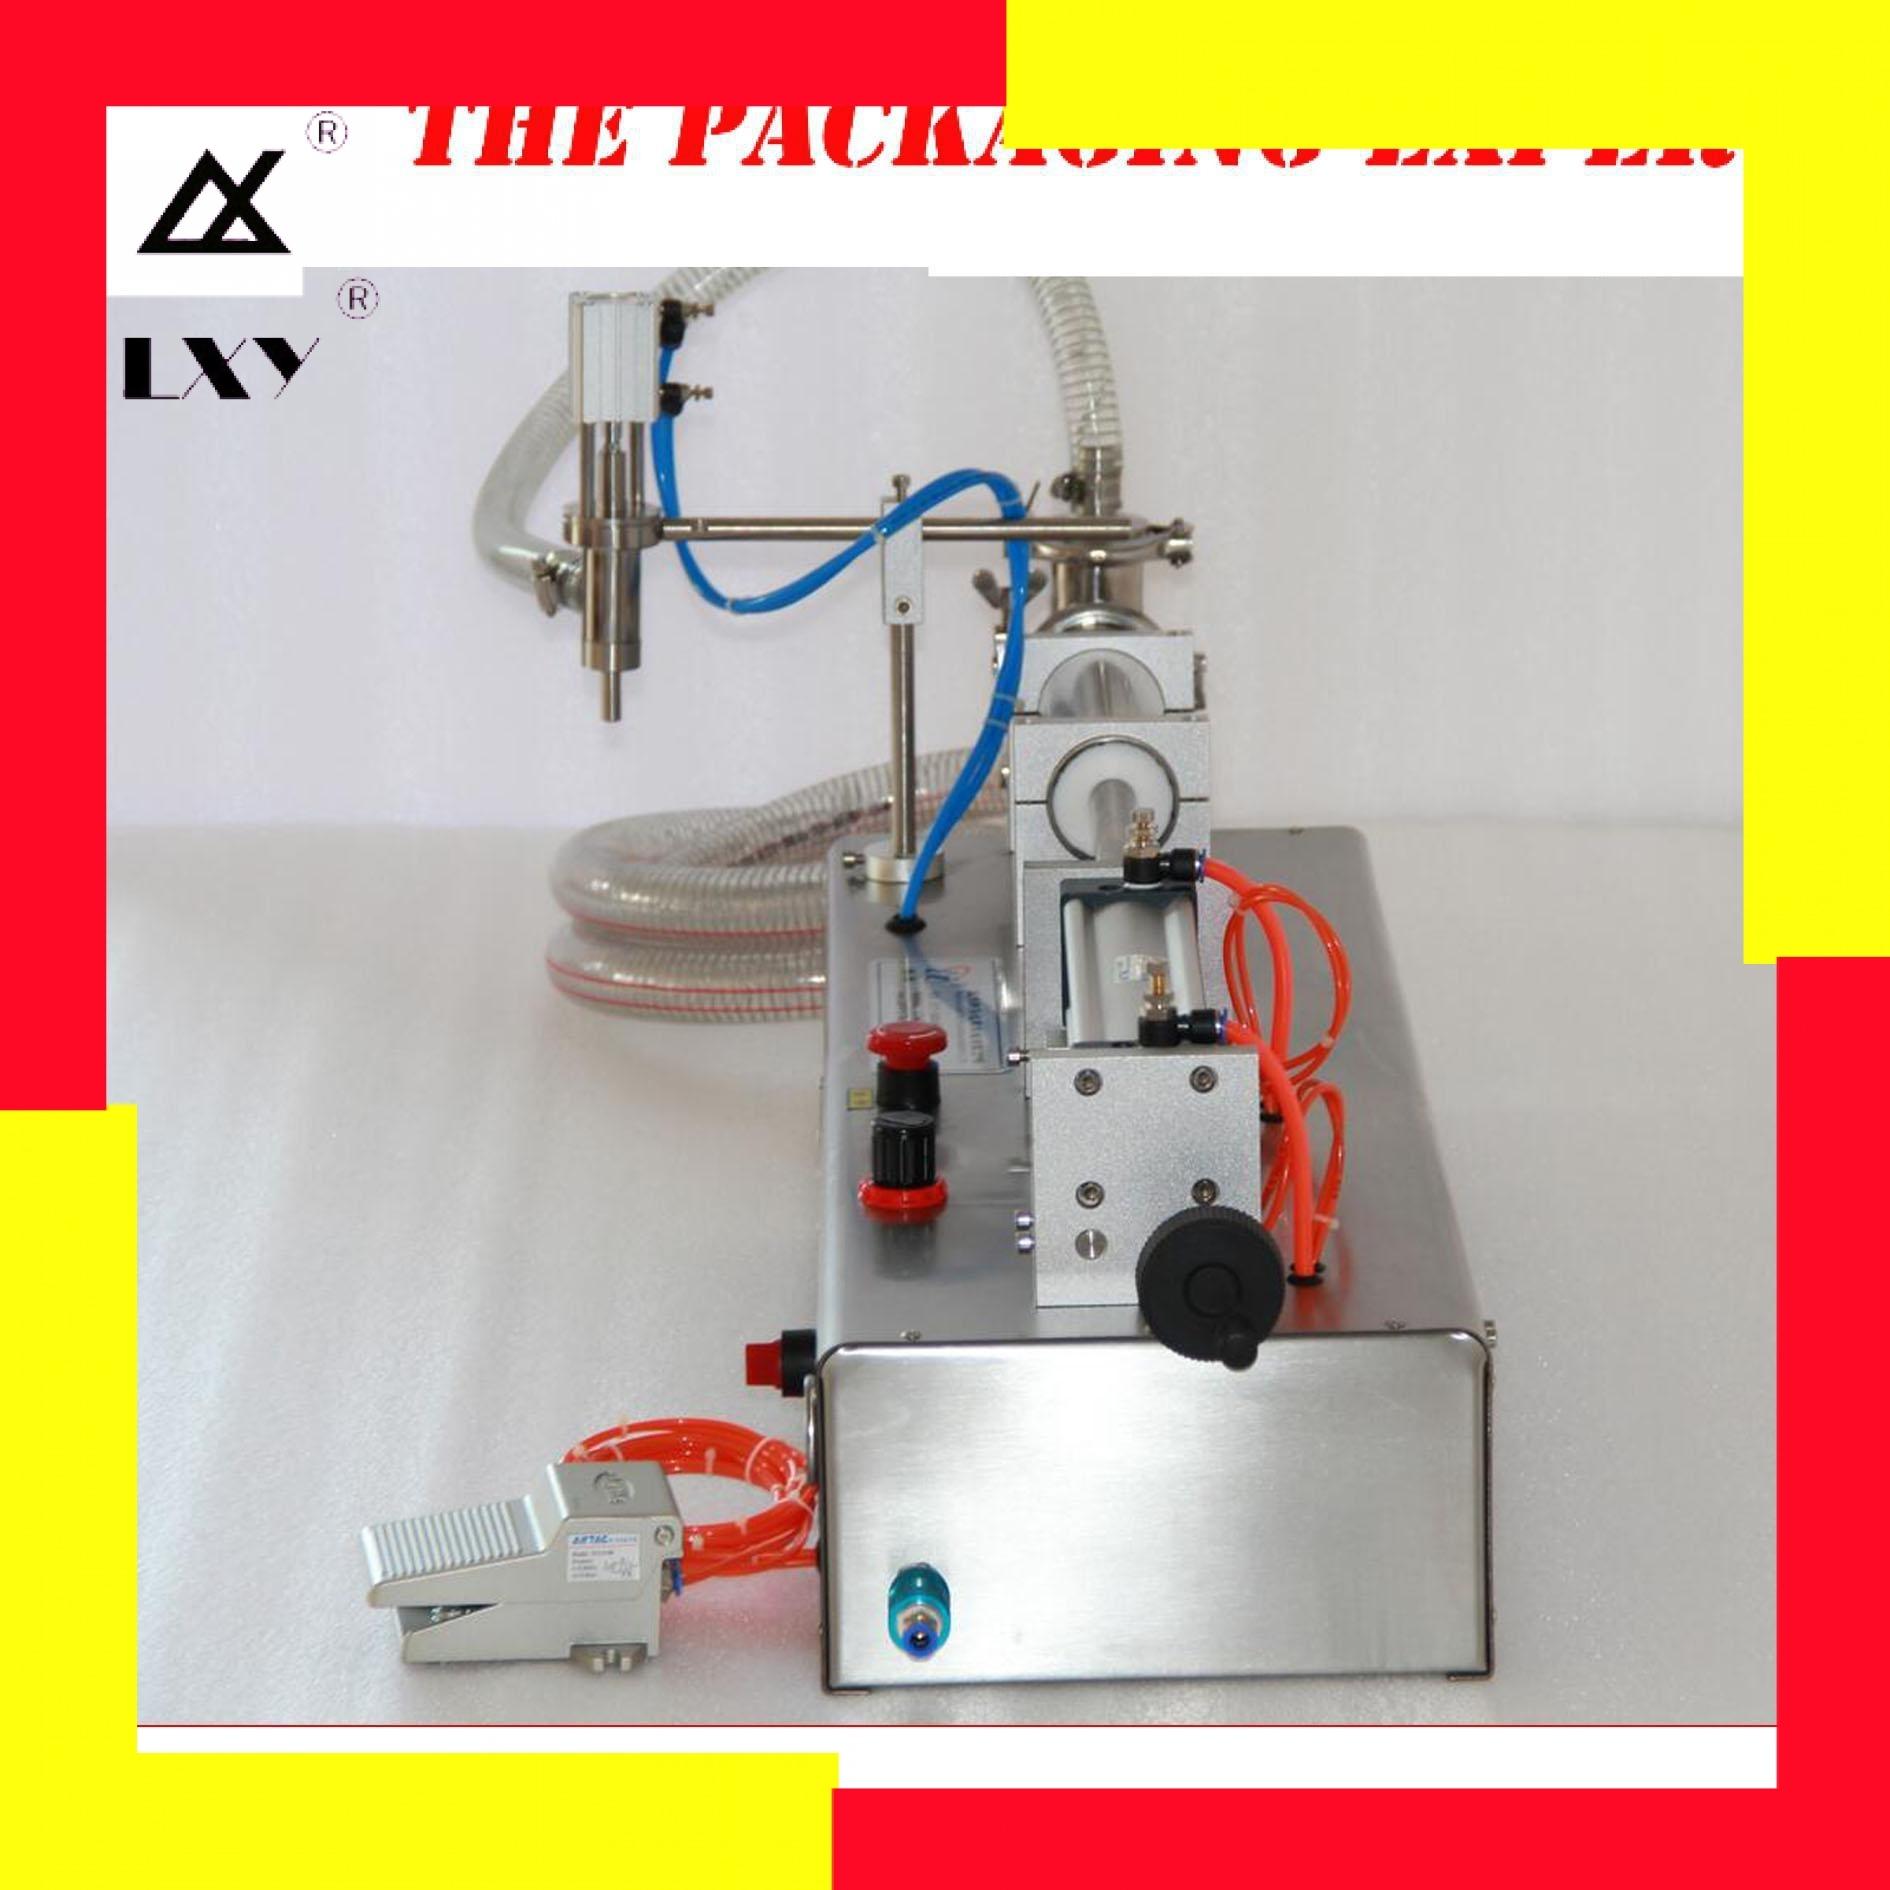 100-1000ml Fully Pneumatic Piston Liquid Filler Shampoo Juice Vinegar Coffee Oil Filling Machine Water Filler By Air Power